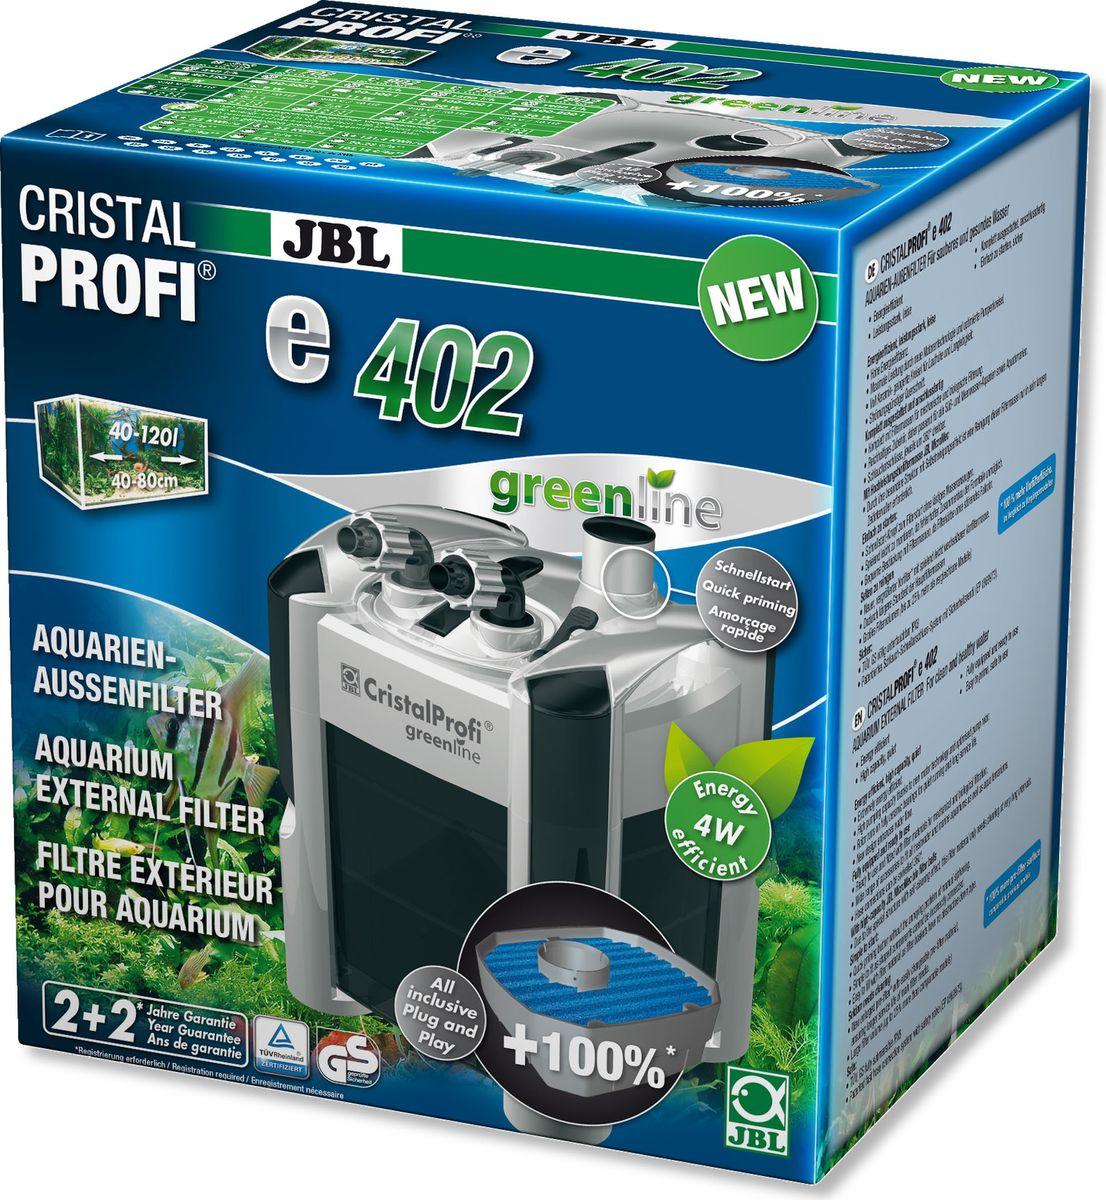 "Фильтр внешний JBL ""CristalProfi e402 greenline +"", для аквариумов объемом 40-120 л"